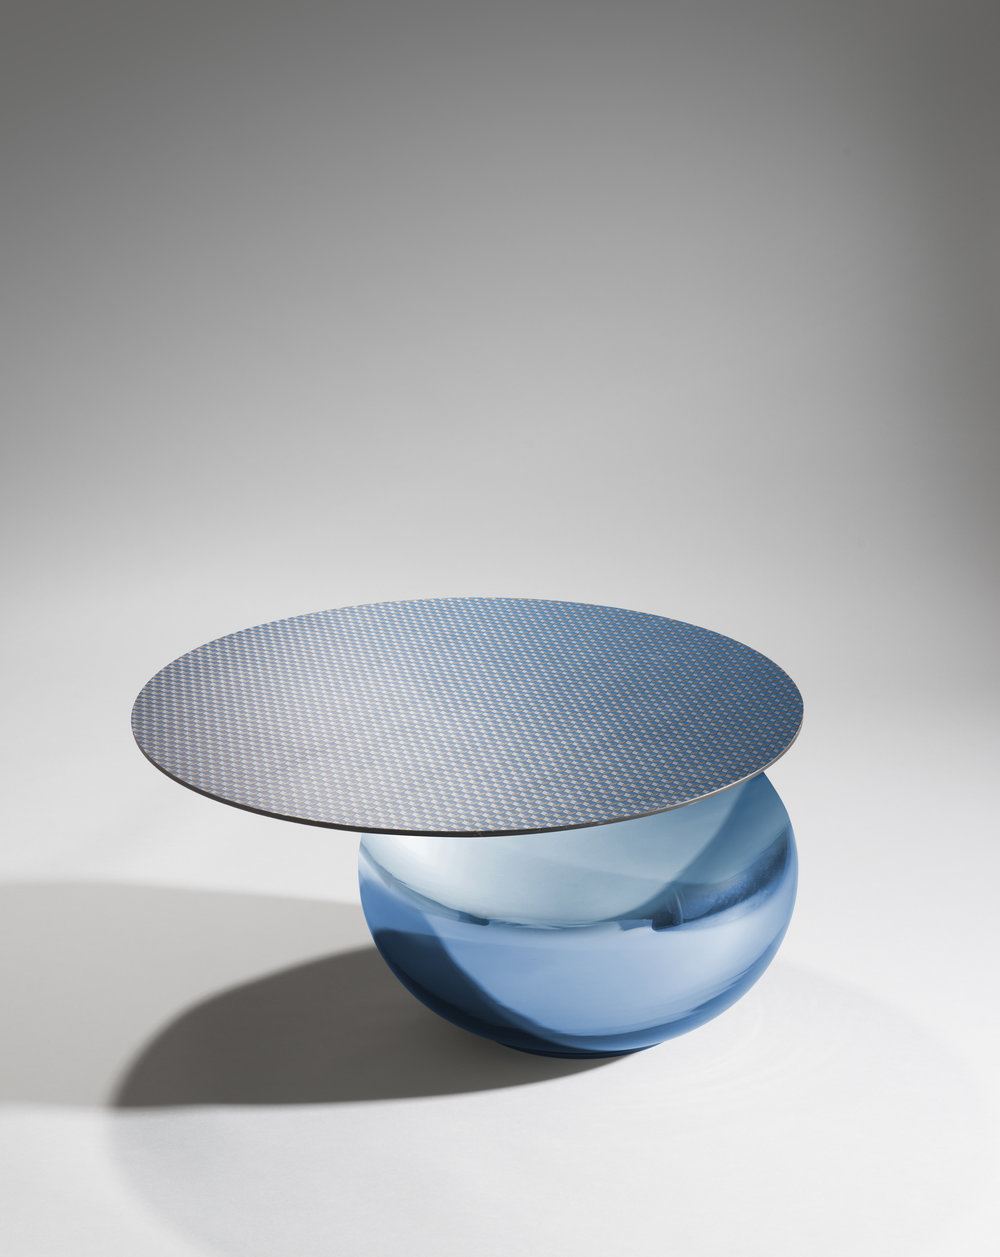 Mursi _ Piergil Fourquié _ Galerie Gosserez _ 2016